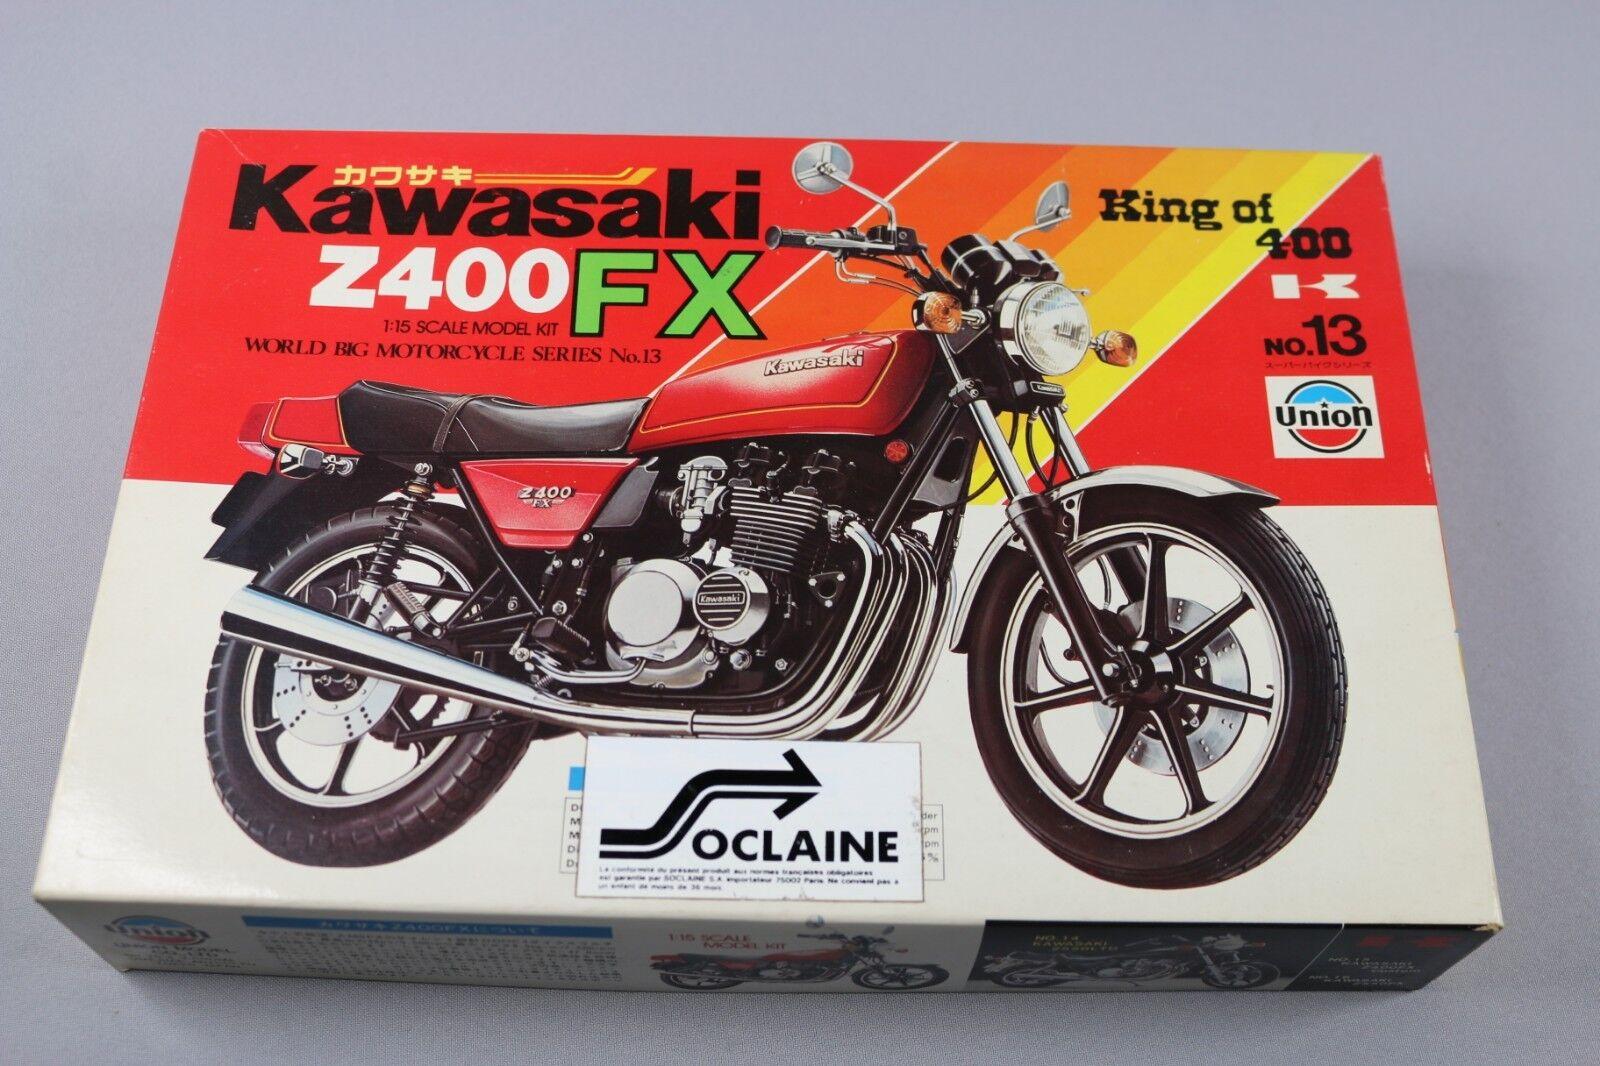 Zf1011 Union 1 15 Maqueta M-13 700 Kawasaki Z400fx World Big Motorcycles Serie